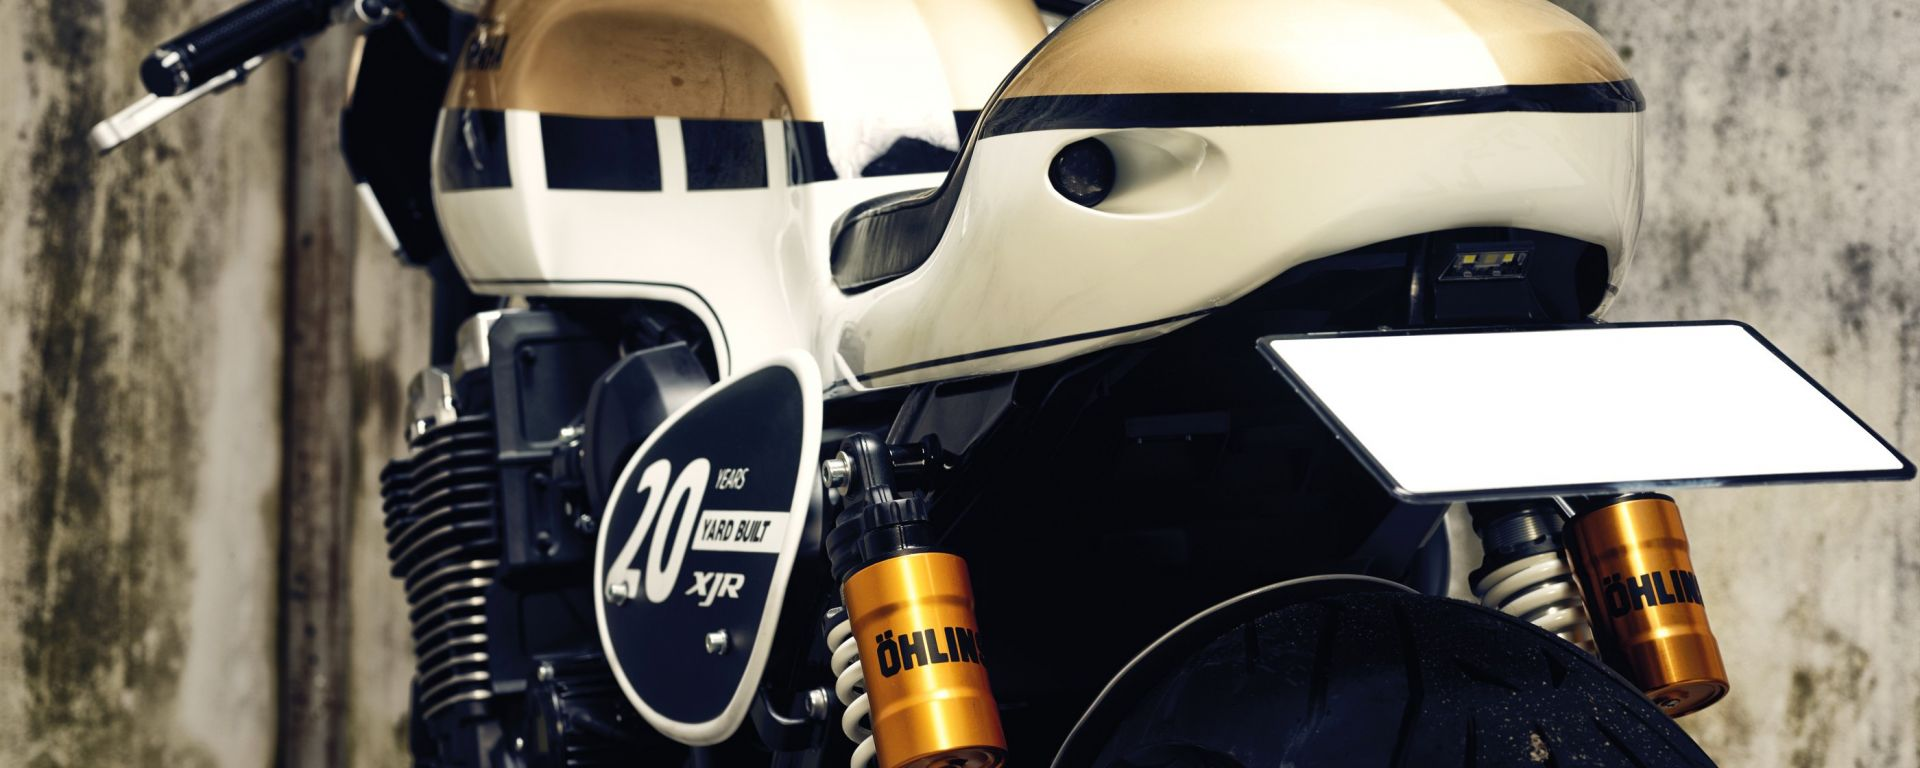 Yamaha XJR1300 Dissident